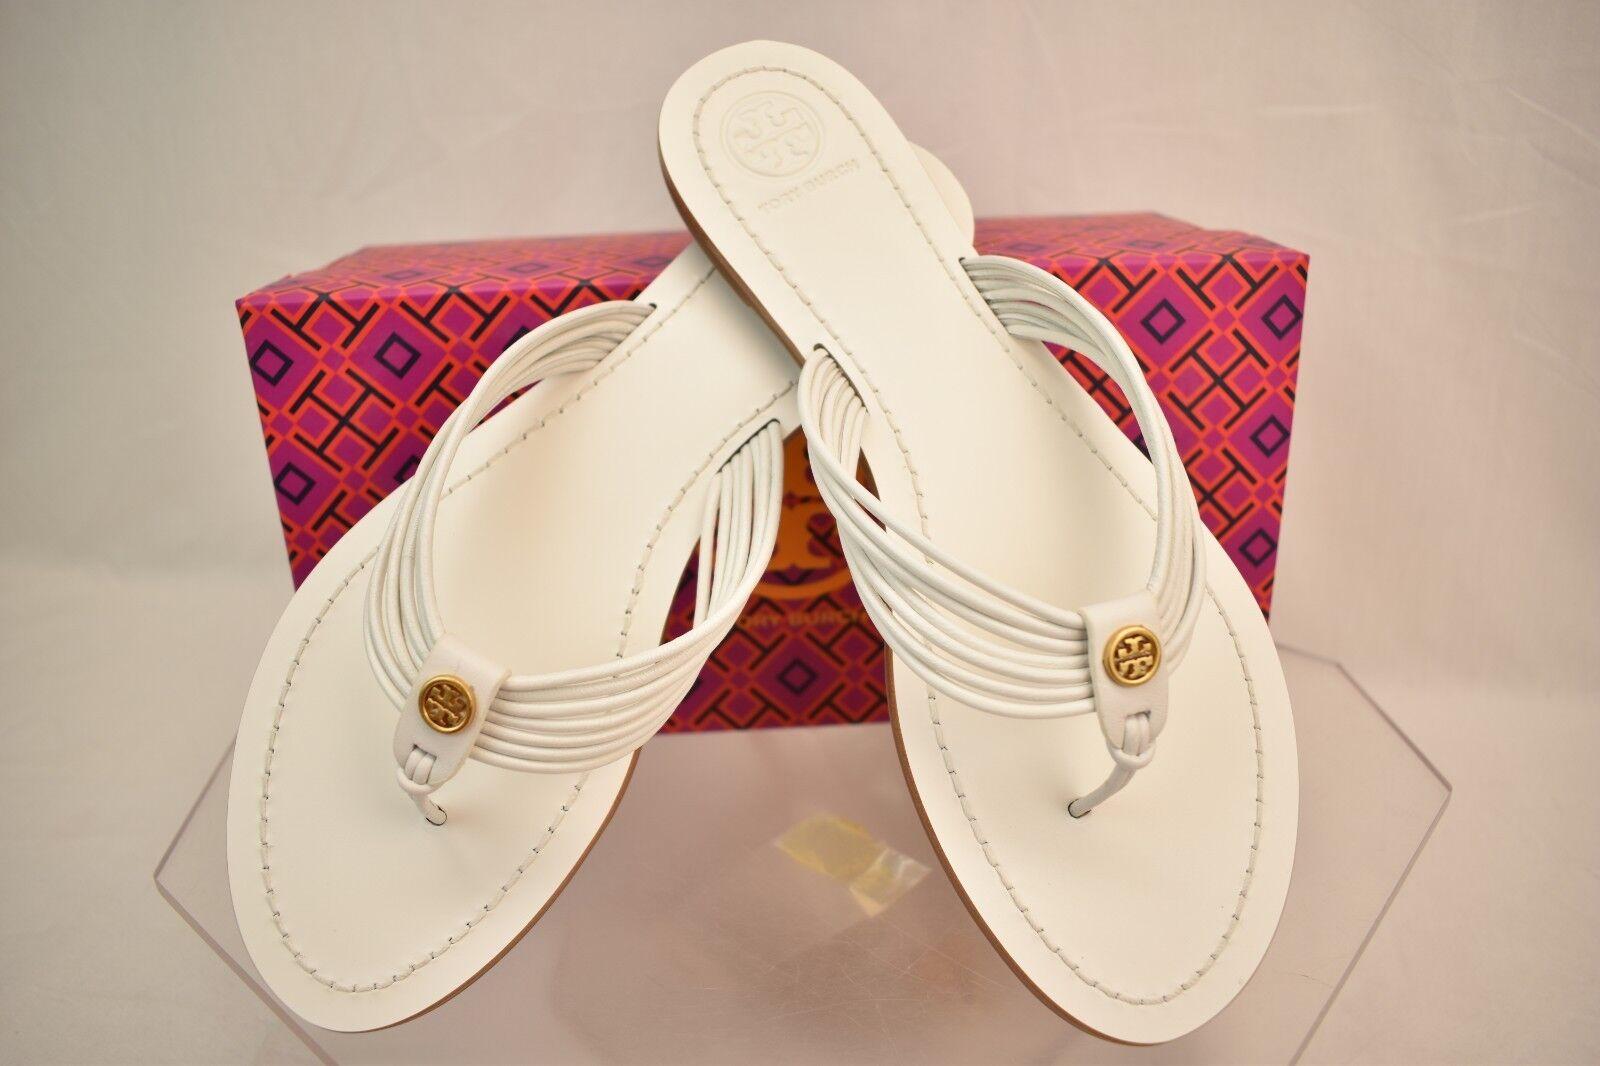 a608fc09e03f Tory Burch Sienna White Glove Nappa Leather Reva Thong Sandals 11 ...